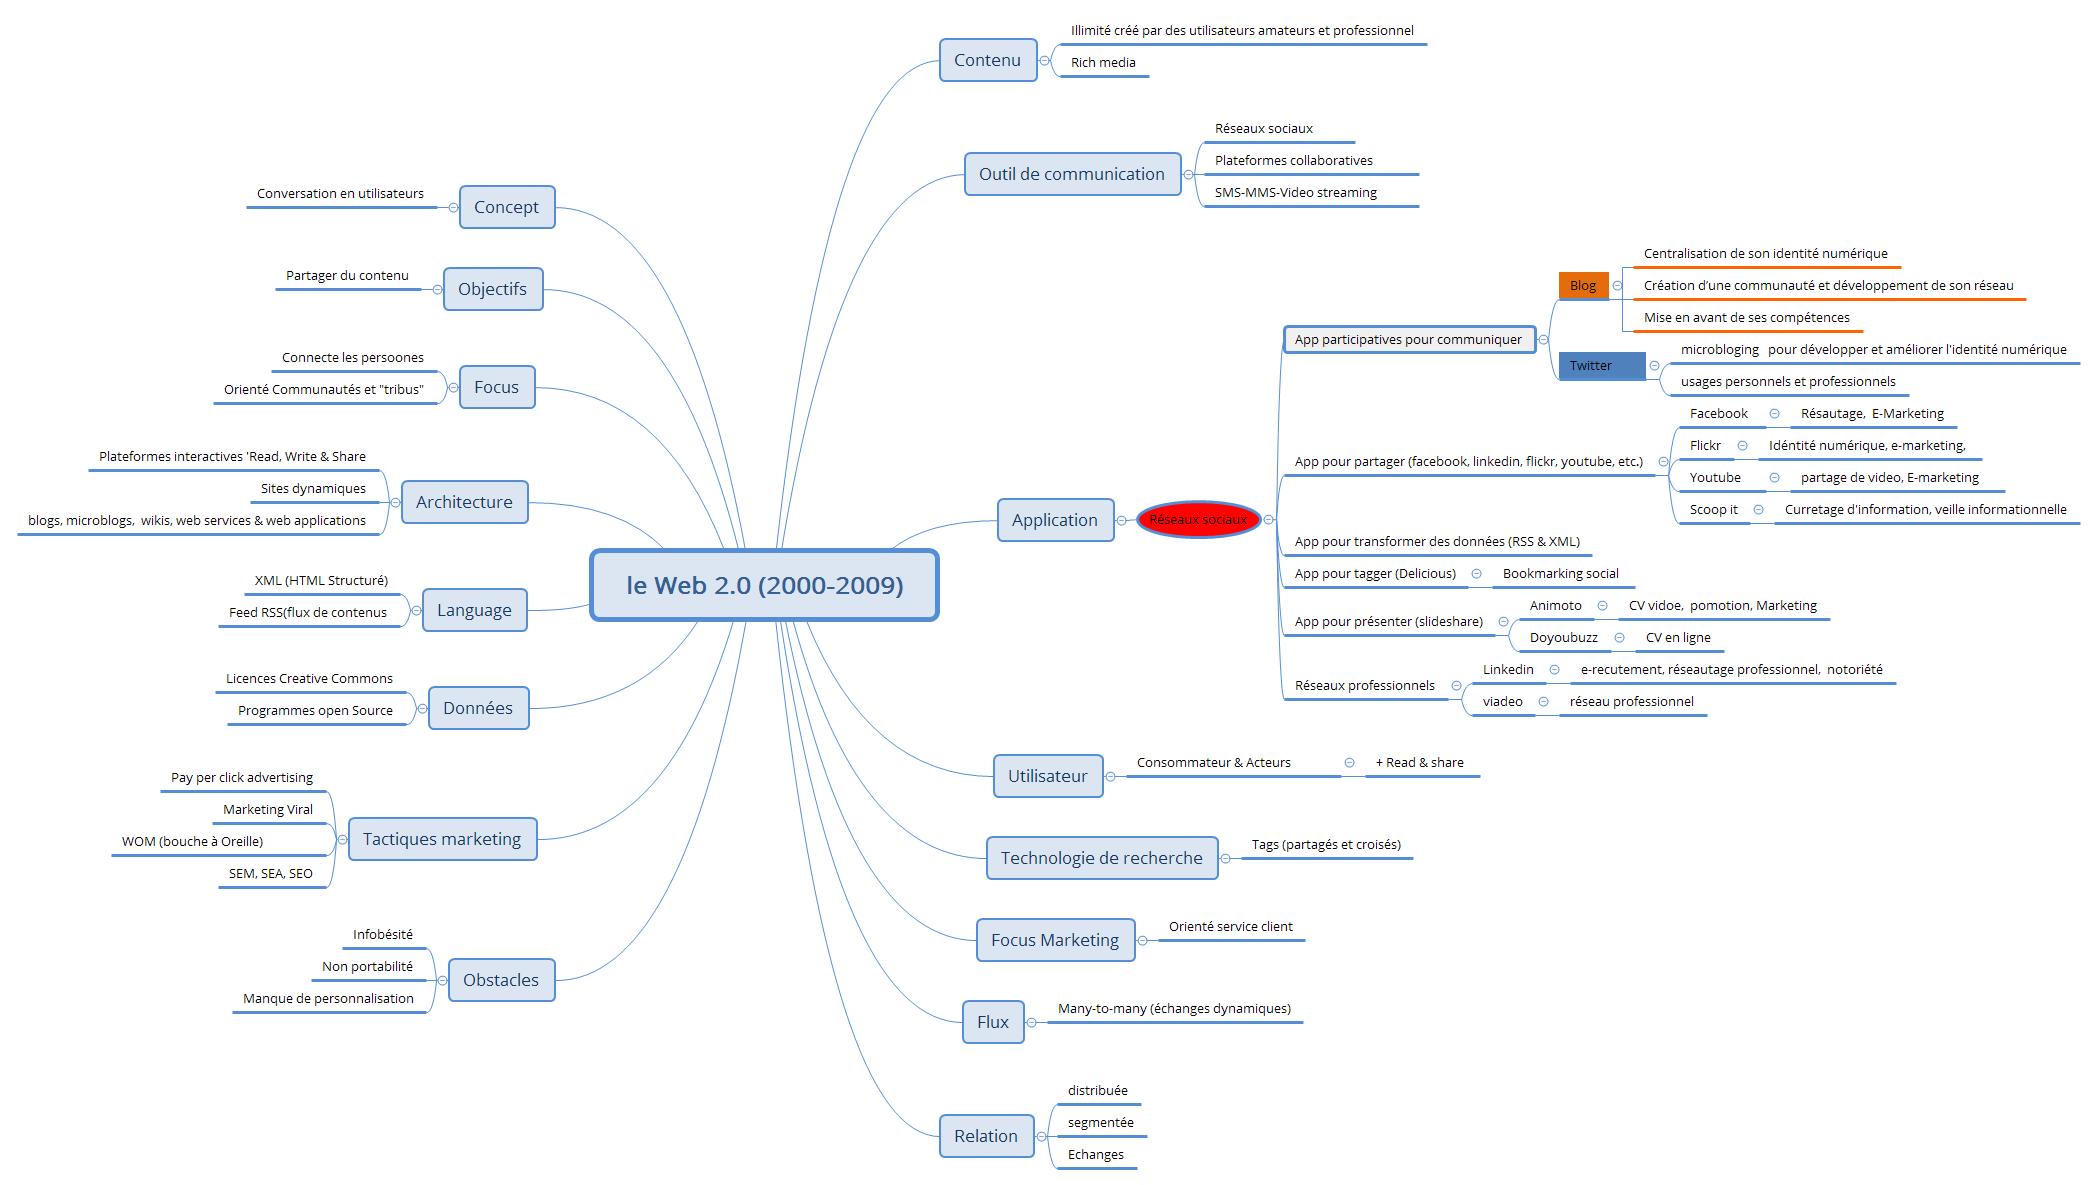 le Web 2.0 (2000-2009)